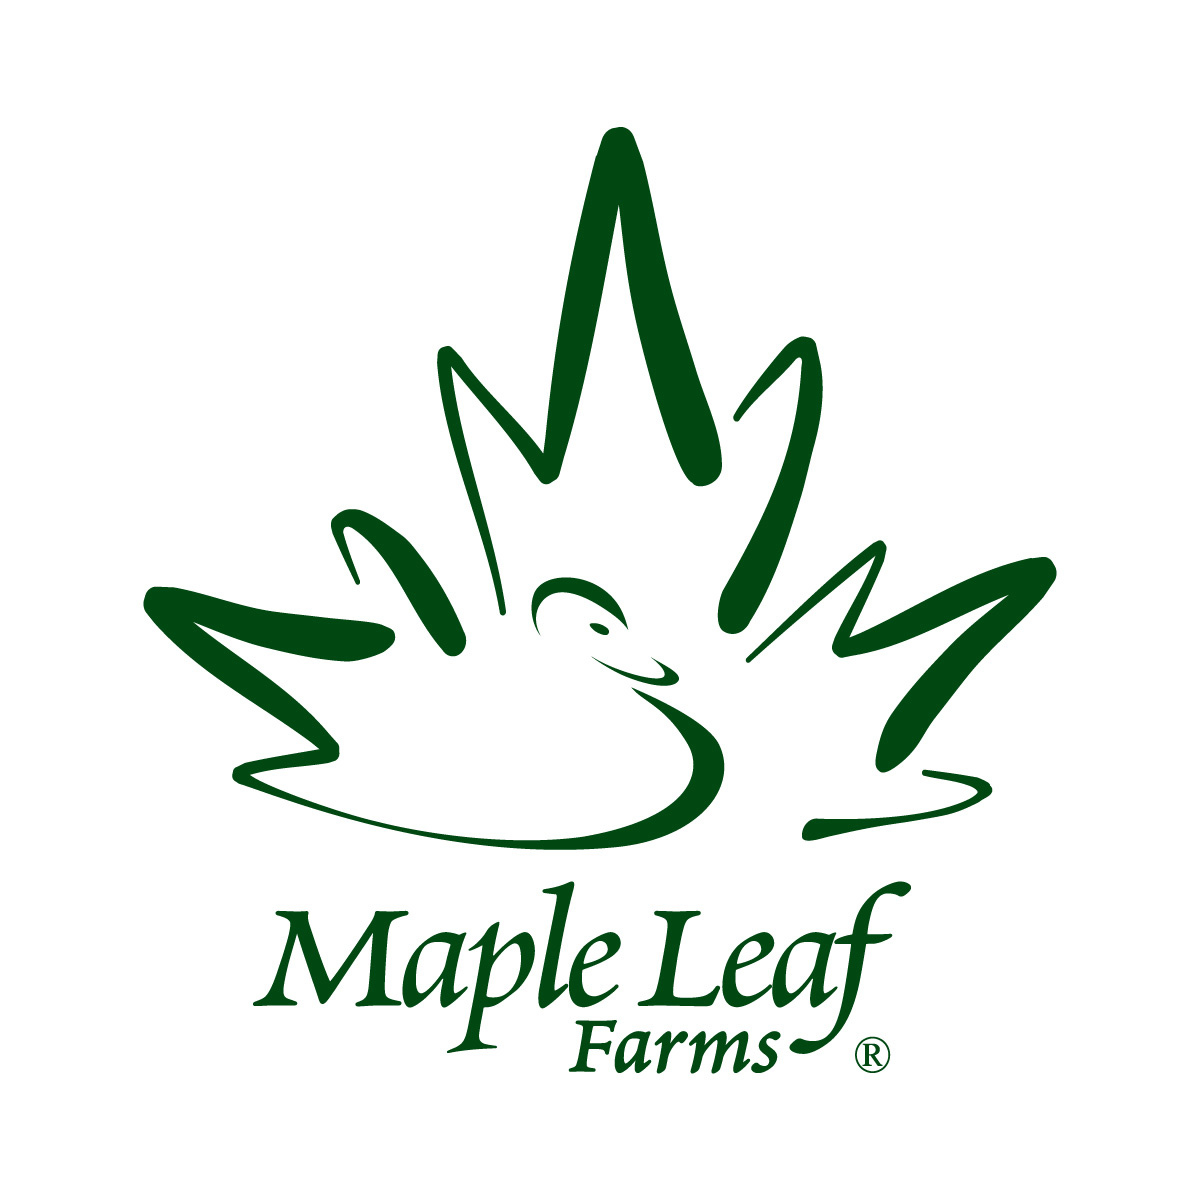 Maple Leaf Farms Logo Maple Leaf Farms Introduces